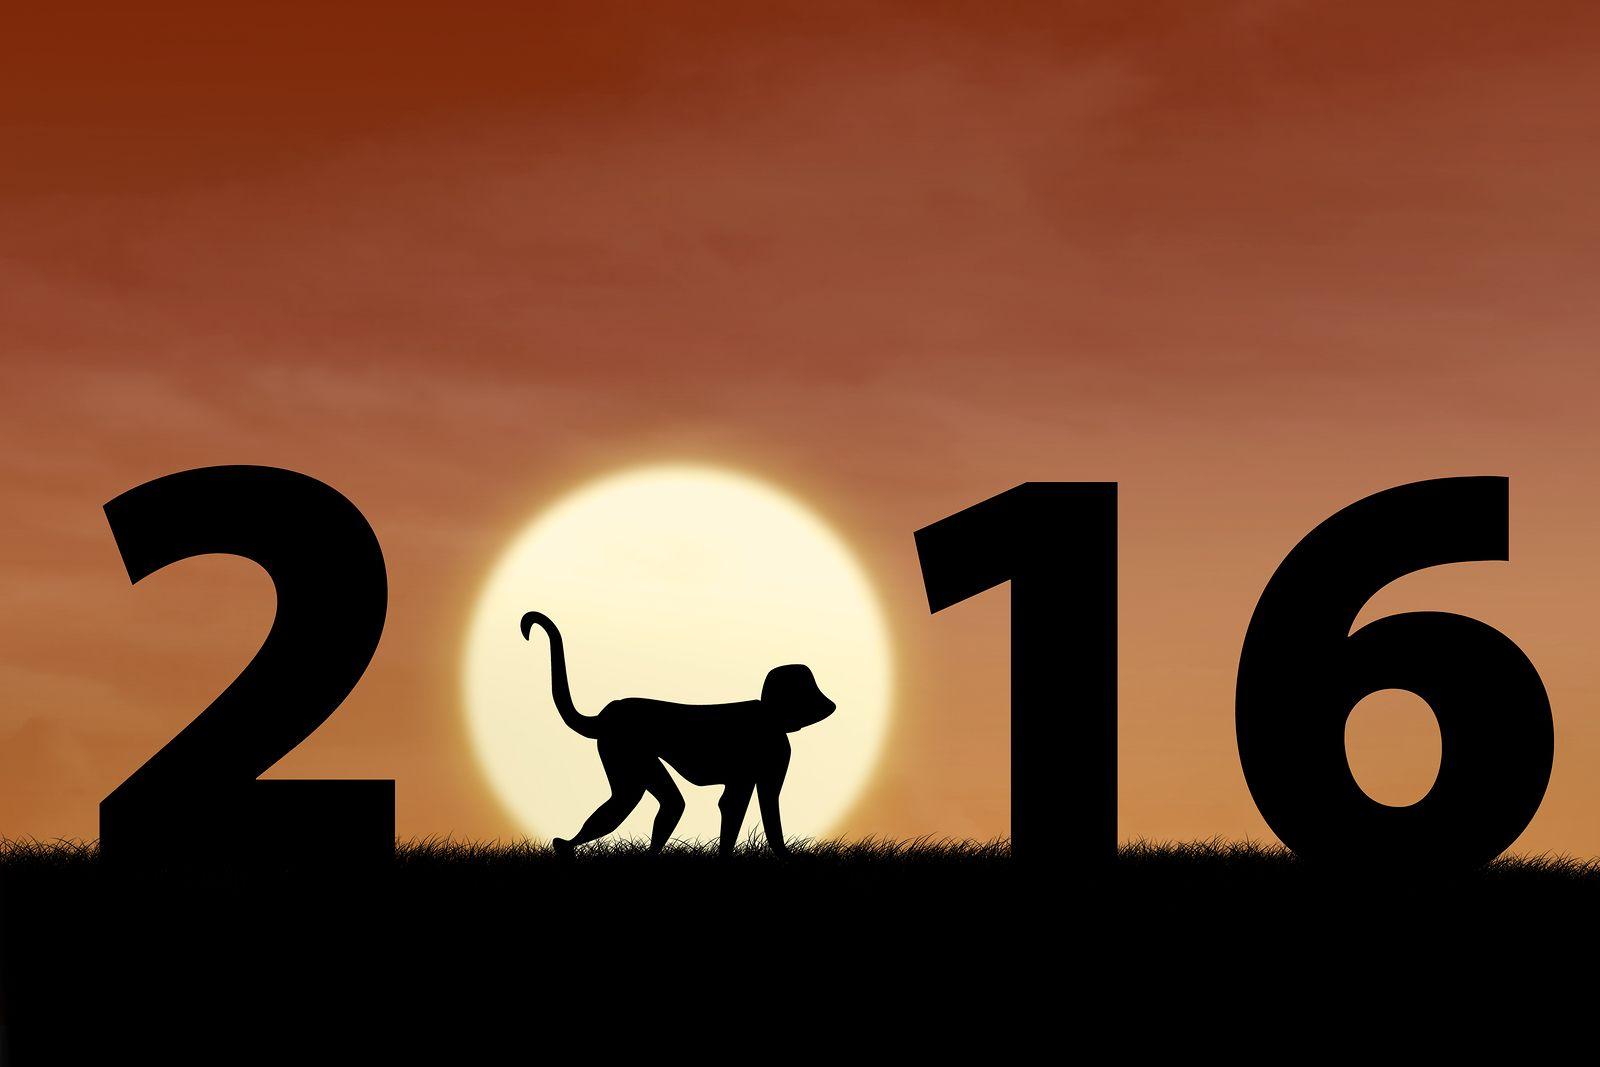 2016 The Year of the Monkey Year of the monkey, Chinese